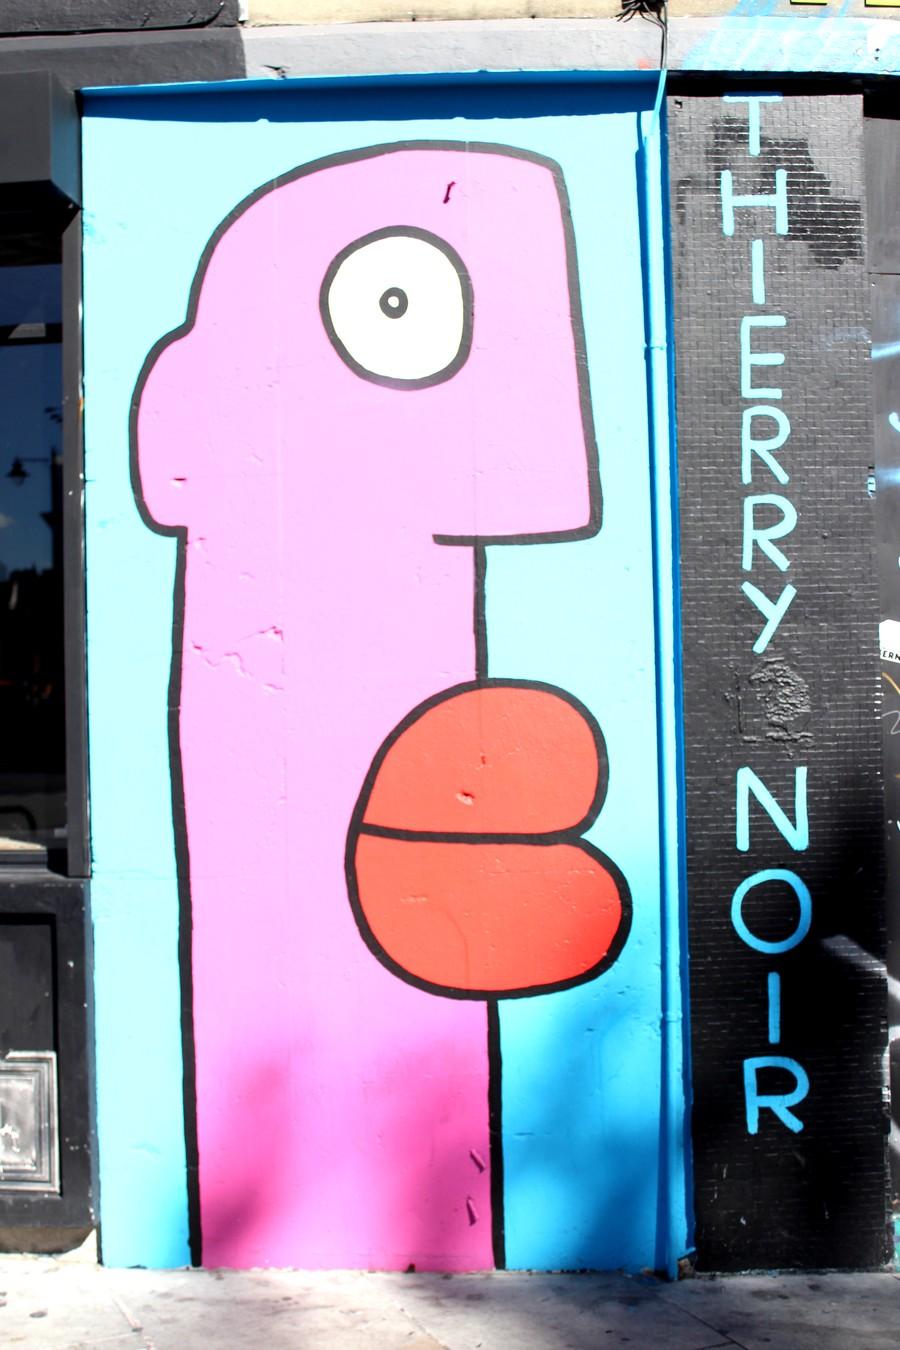 thierry noir street-art london